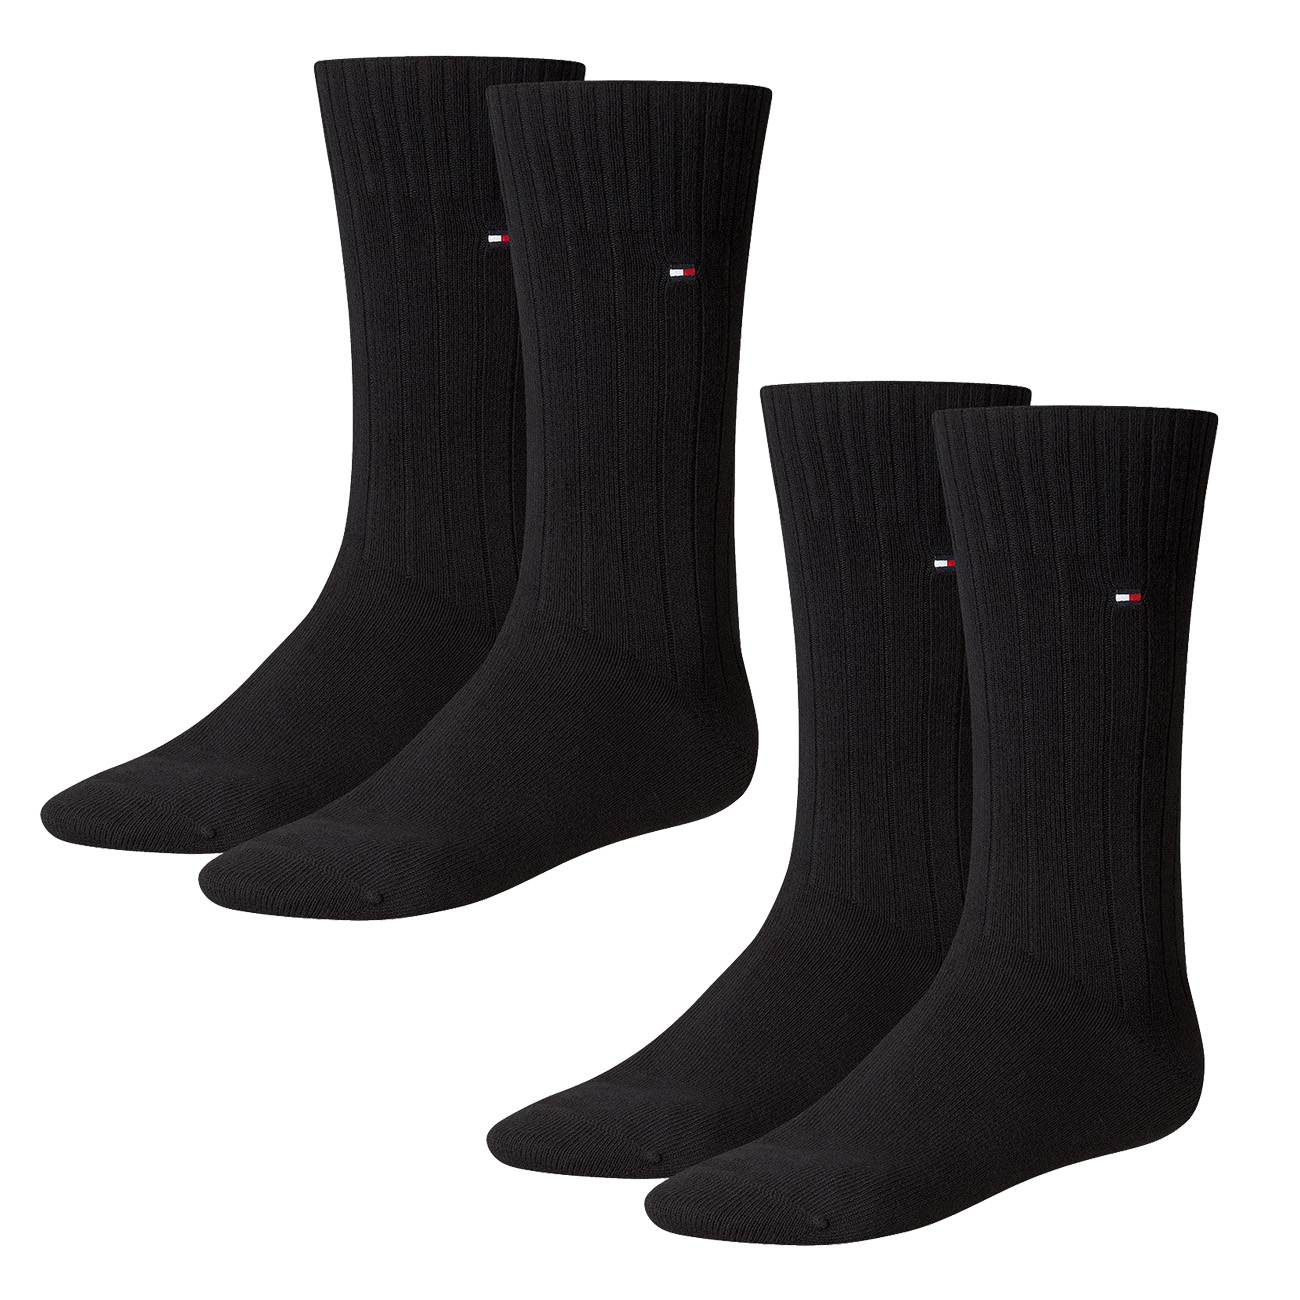 2 x Tommy Hilfiger Quater Socken Strümpfe Herren jeans blau Basic Fashion Socks